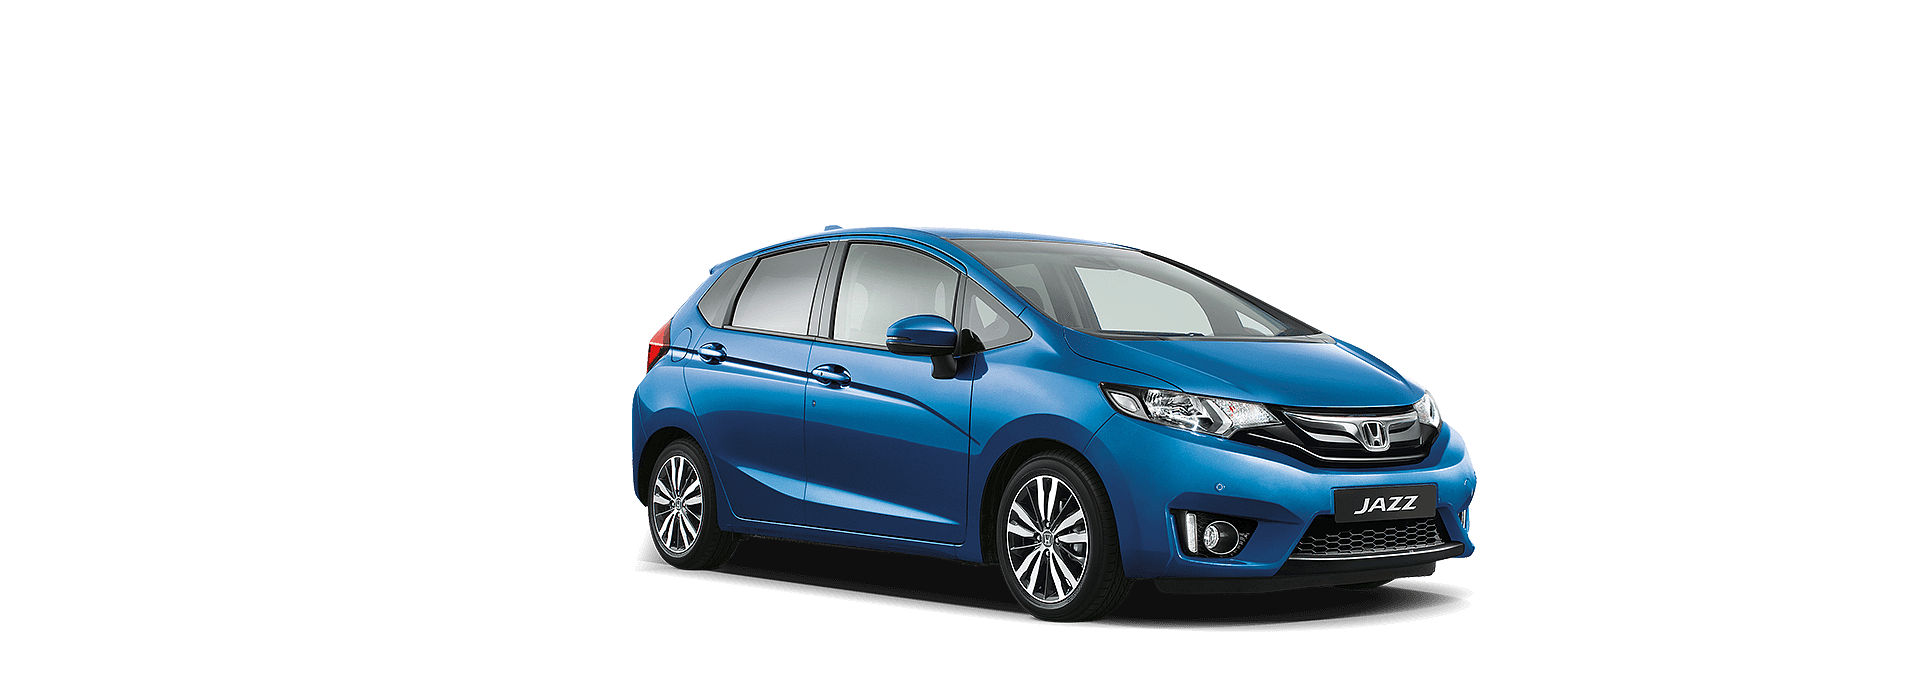 Honda Used Cars >> Used Honda Jazz 5 Door Hatchback Buy Approved Second Hand